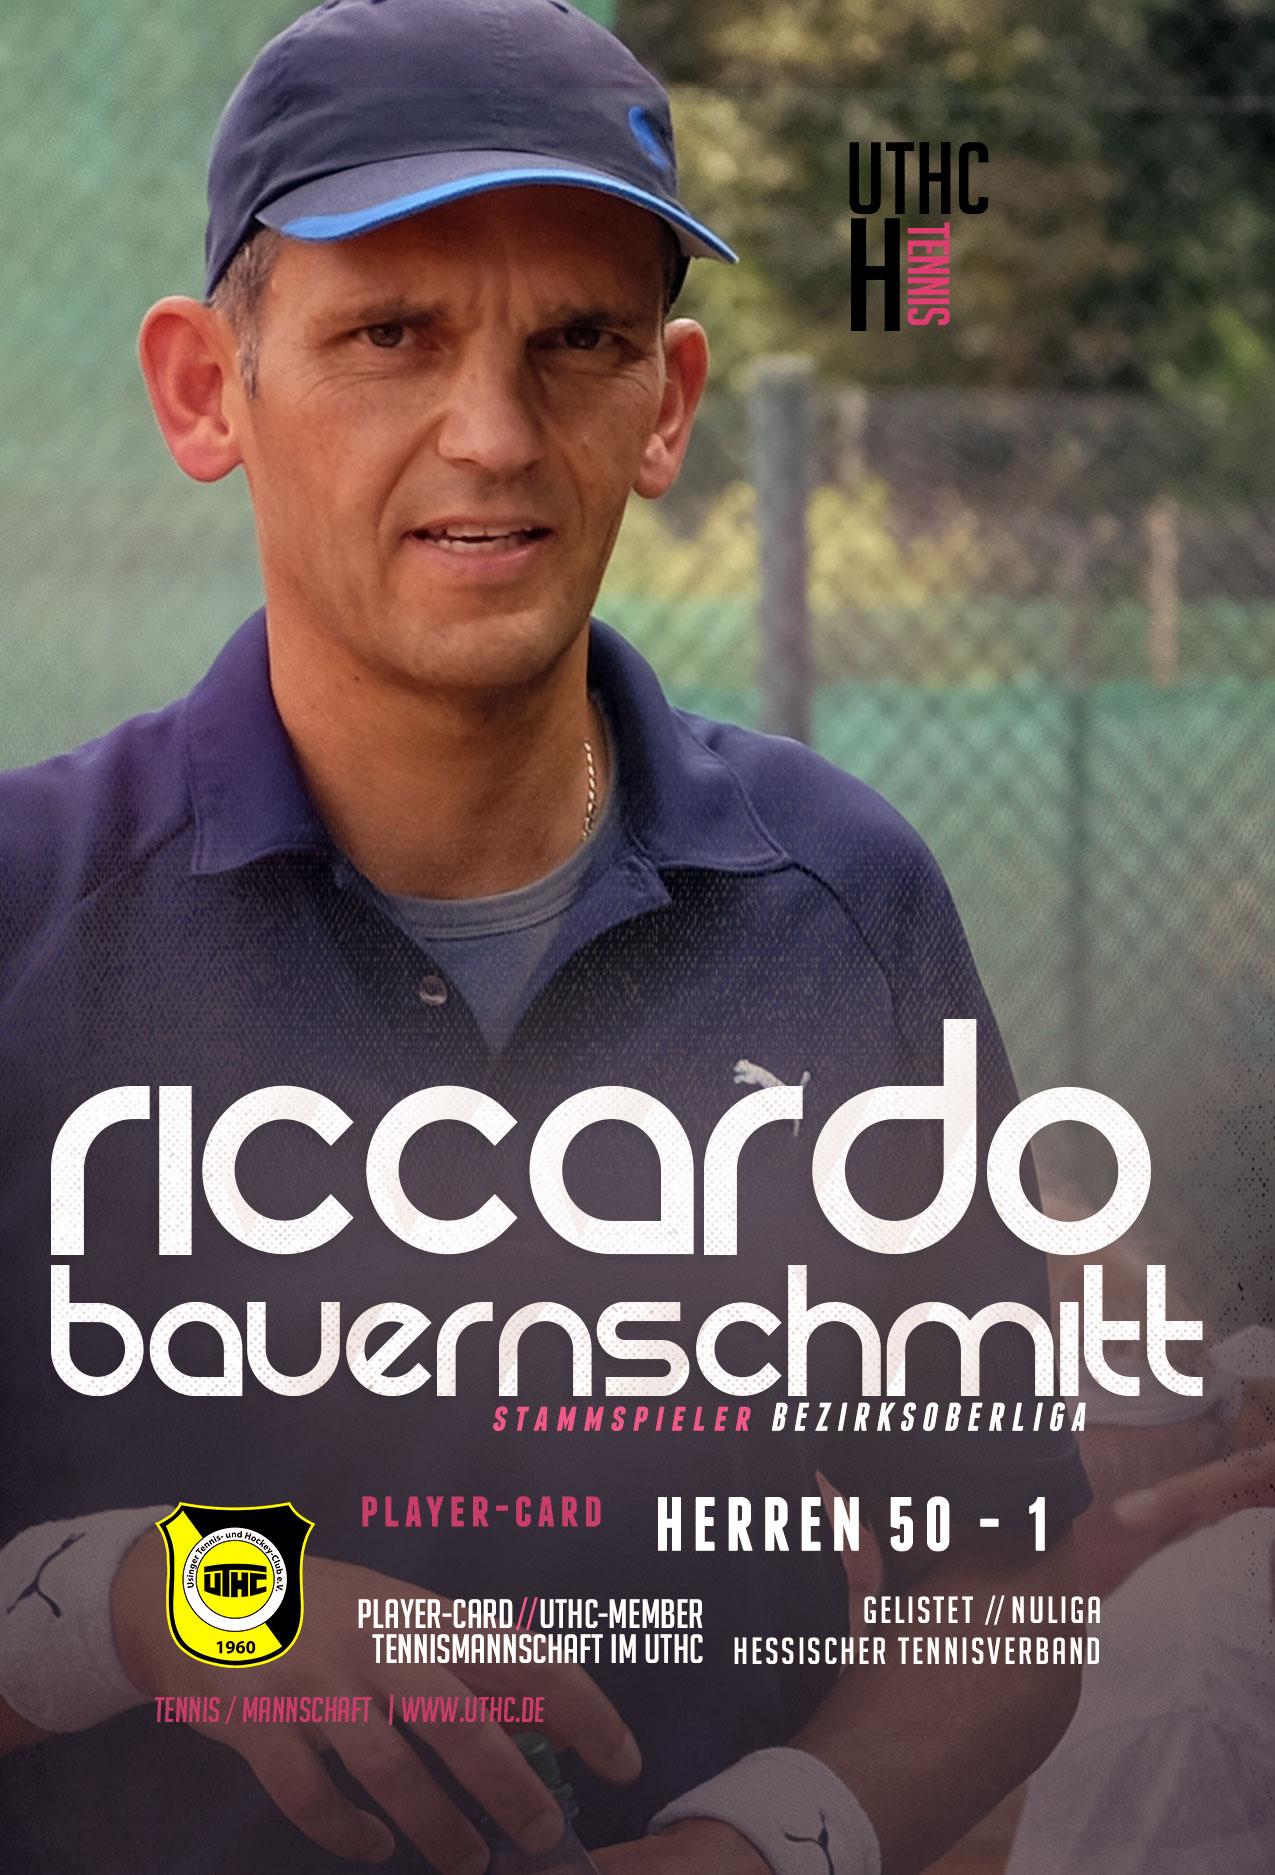 Tennis Spielerportrait 2017: Riccardo Bauernschmitt / Bezirksoberliga / Herren 50 / Erste Mannschaft / UTHC